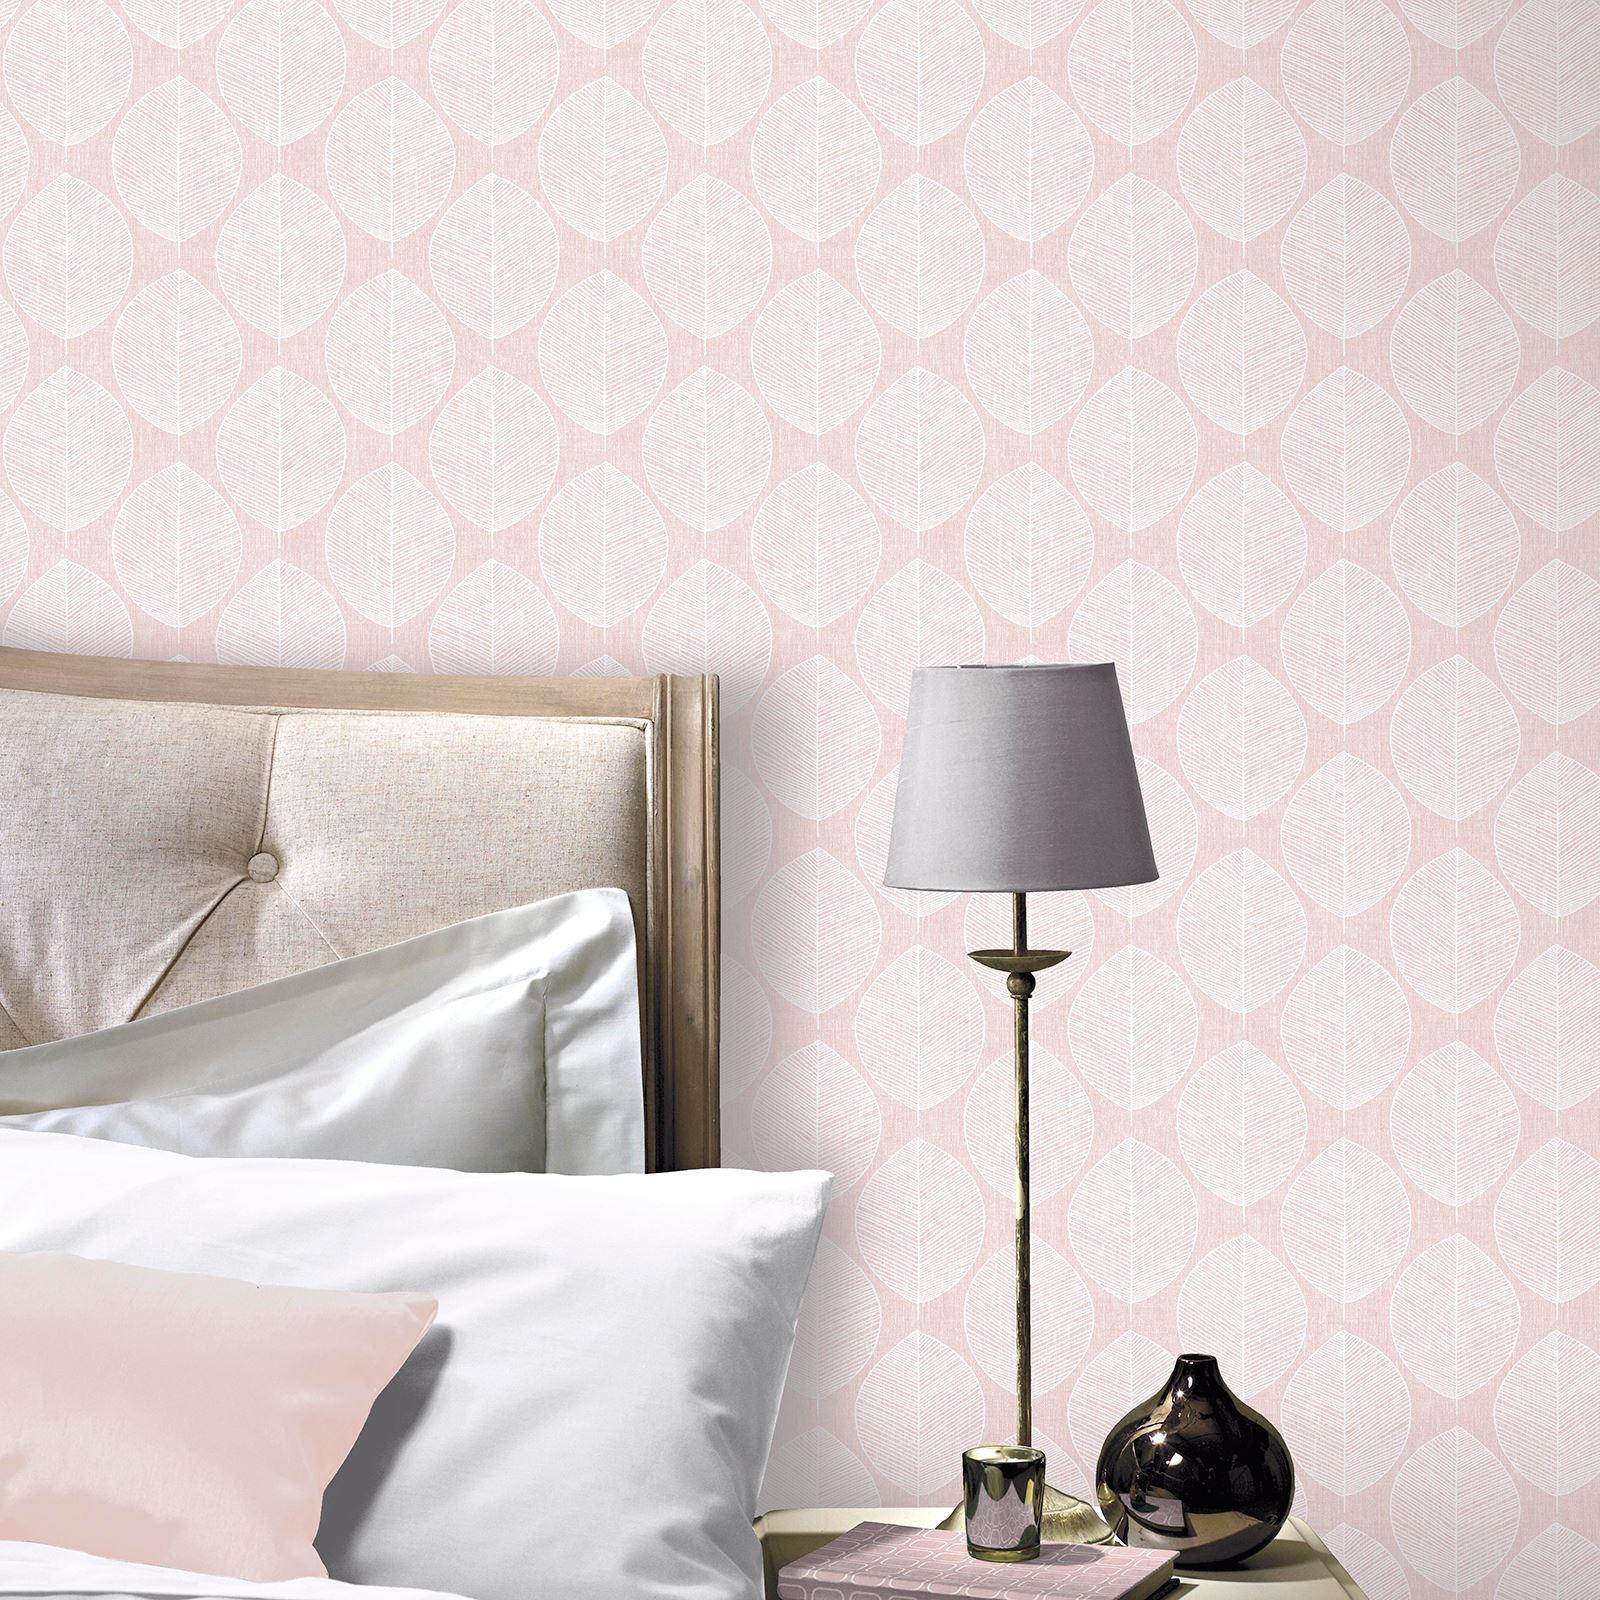 Indexbild 5 - Arthouse Scandi Blatt Tapete - Grau Rosa Blaugrün Schlafzimmer Flur Lounge